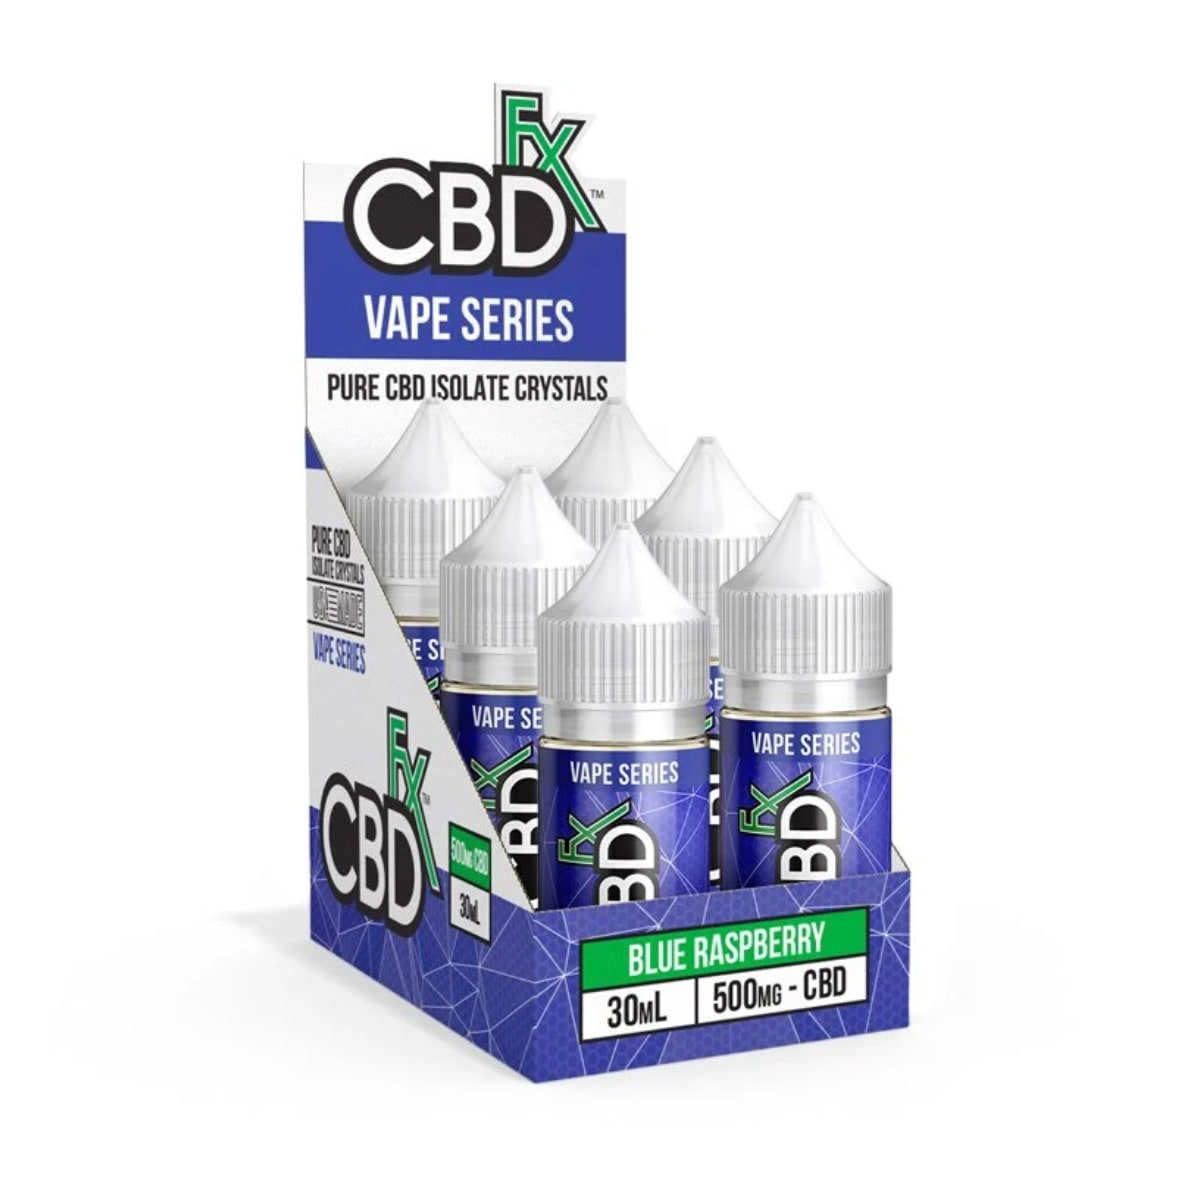 CBDfx, CBD Vape Juice, Blue Raspberry, Isolate THC-Free, 1oz, 500mg of CBD2